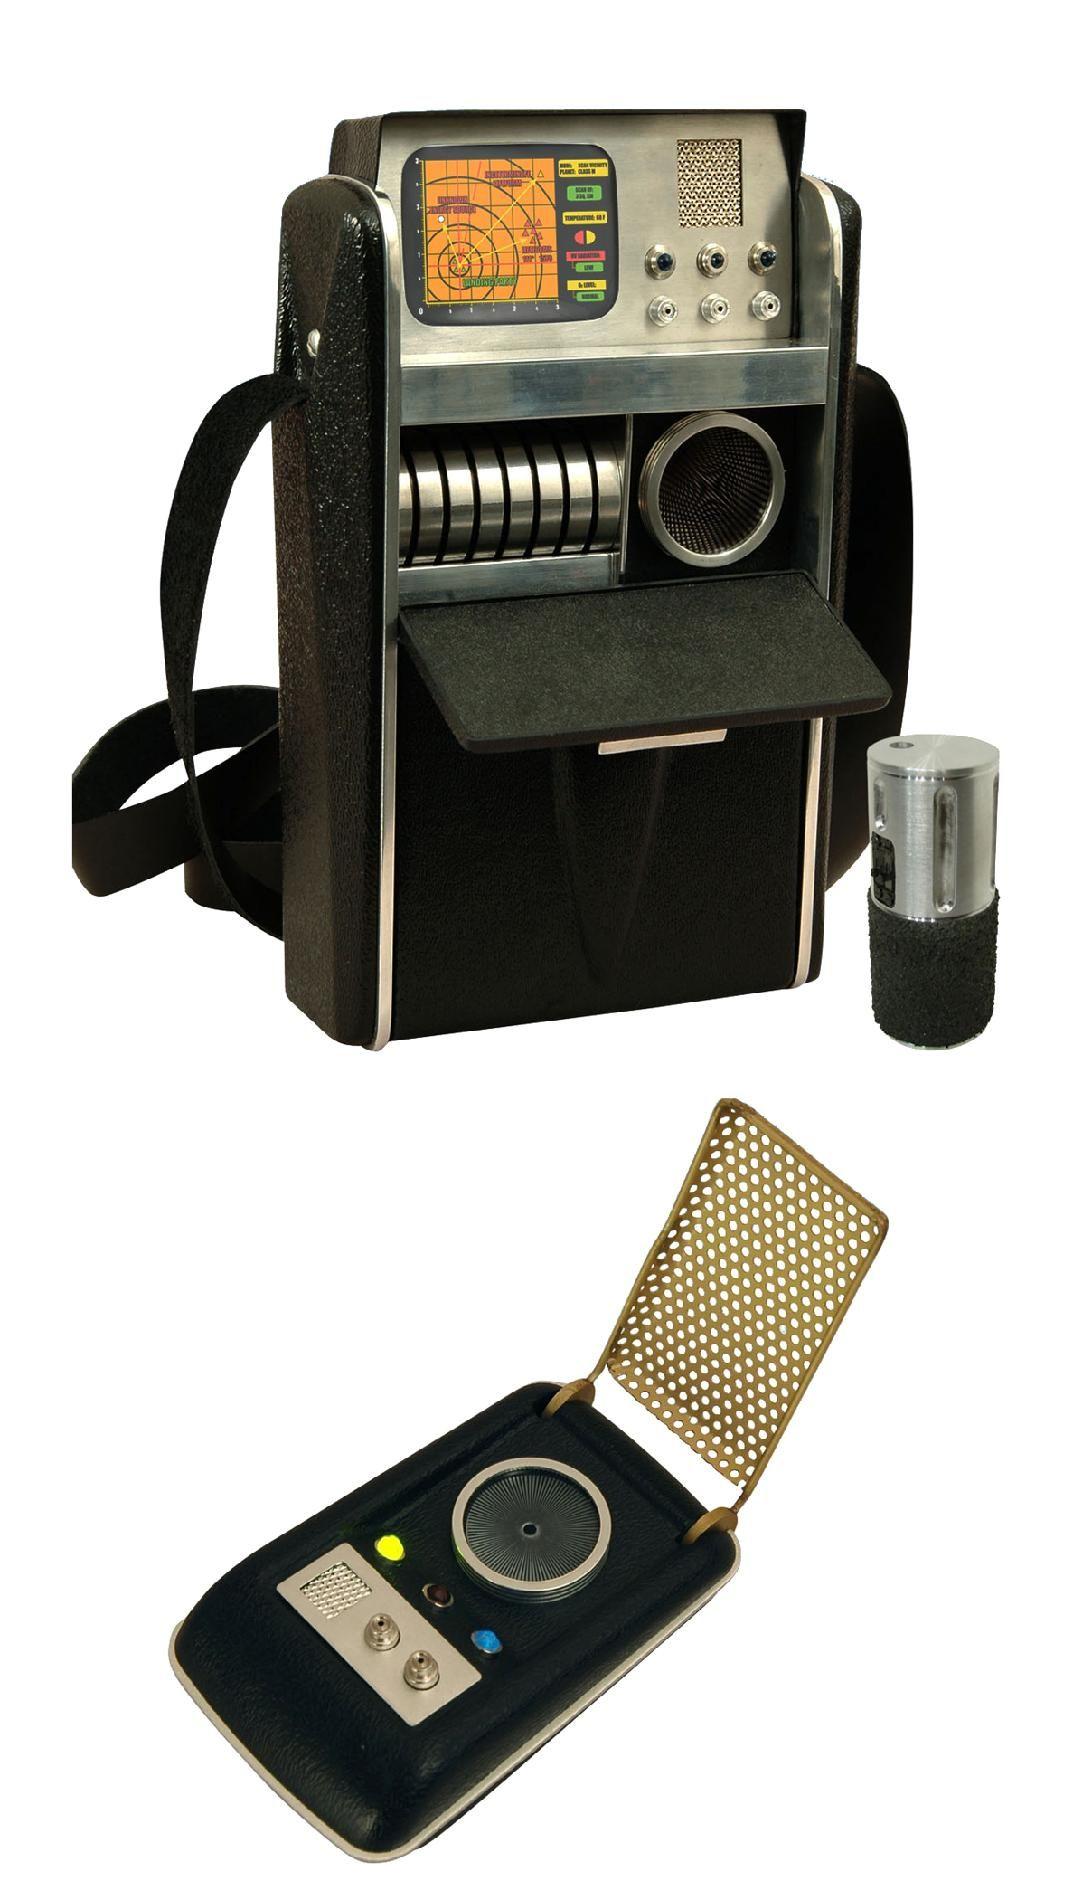 Okay, so it's not a ray gun. Tricorder & Communicator - Star Trek TOS